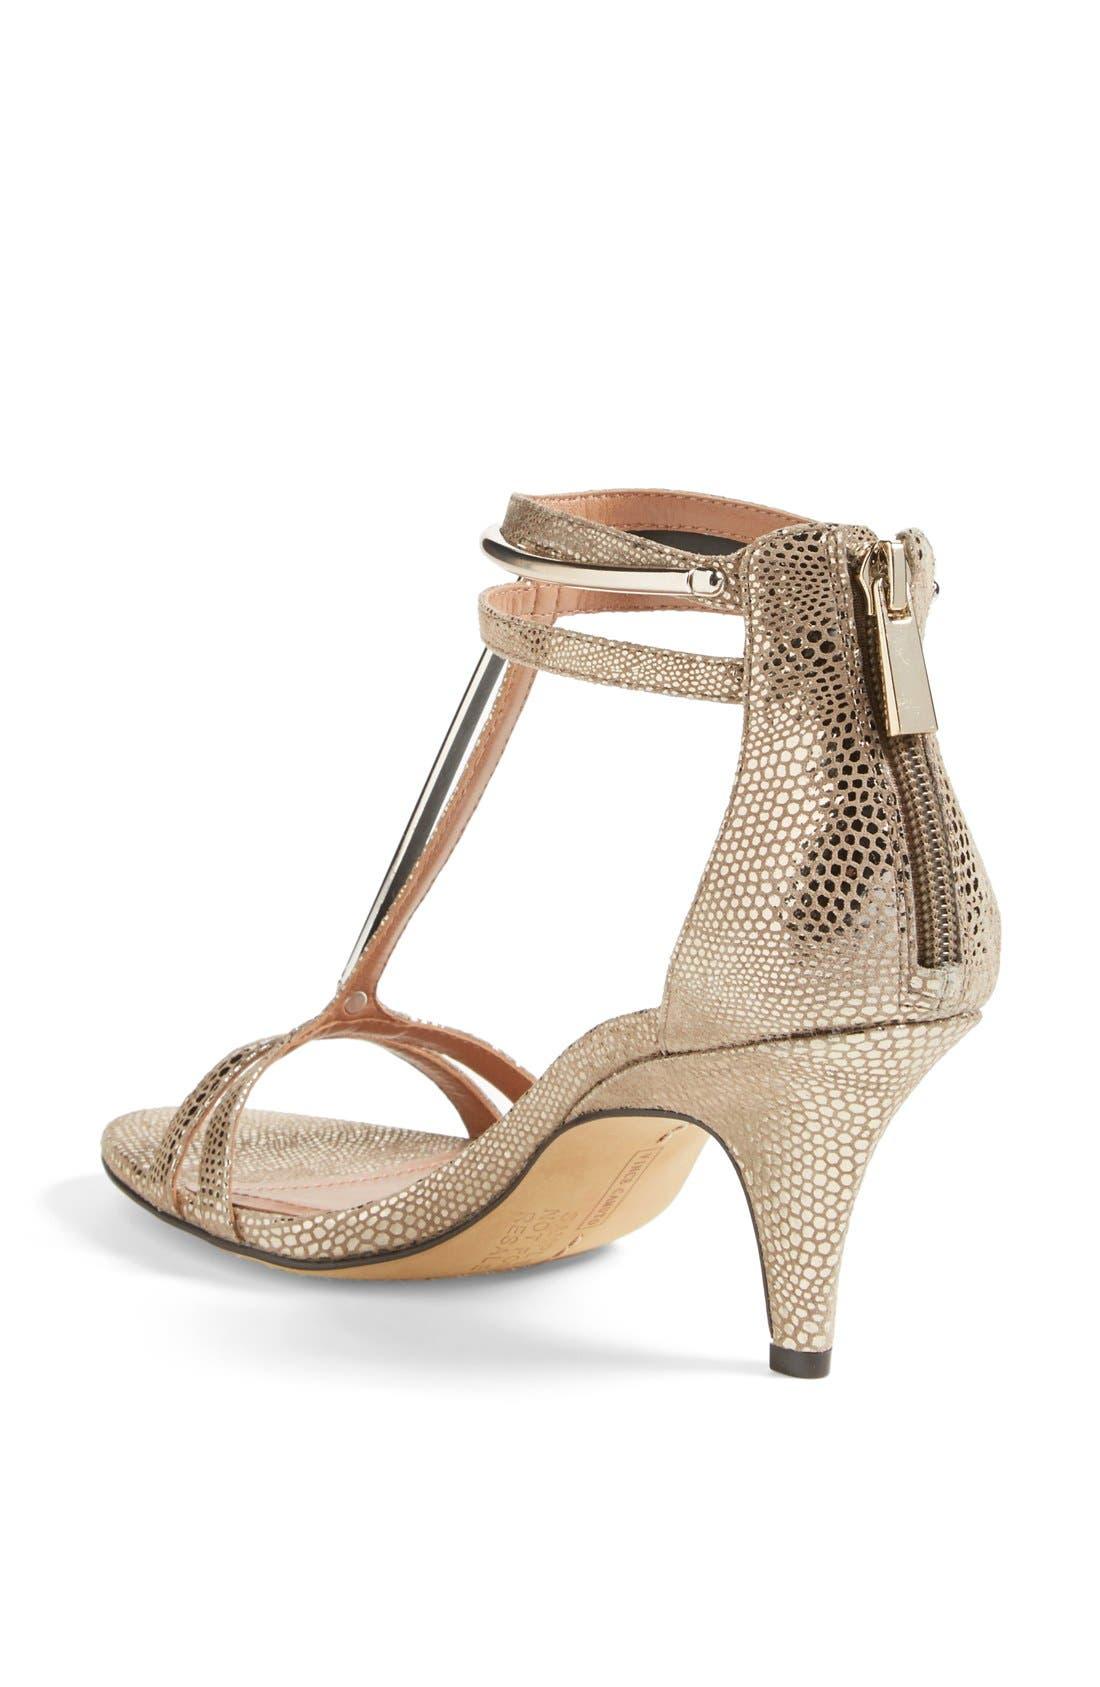 Alternate Image 2  - Vince Camuto 'Mitzy' Metallic T-Strap Sandal (Women)